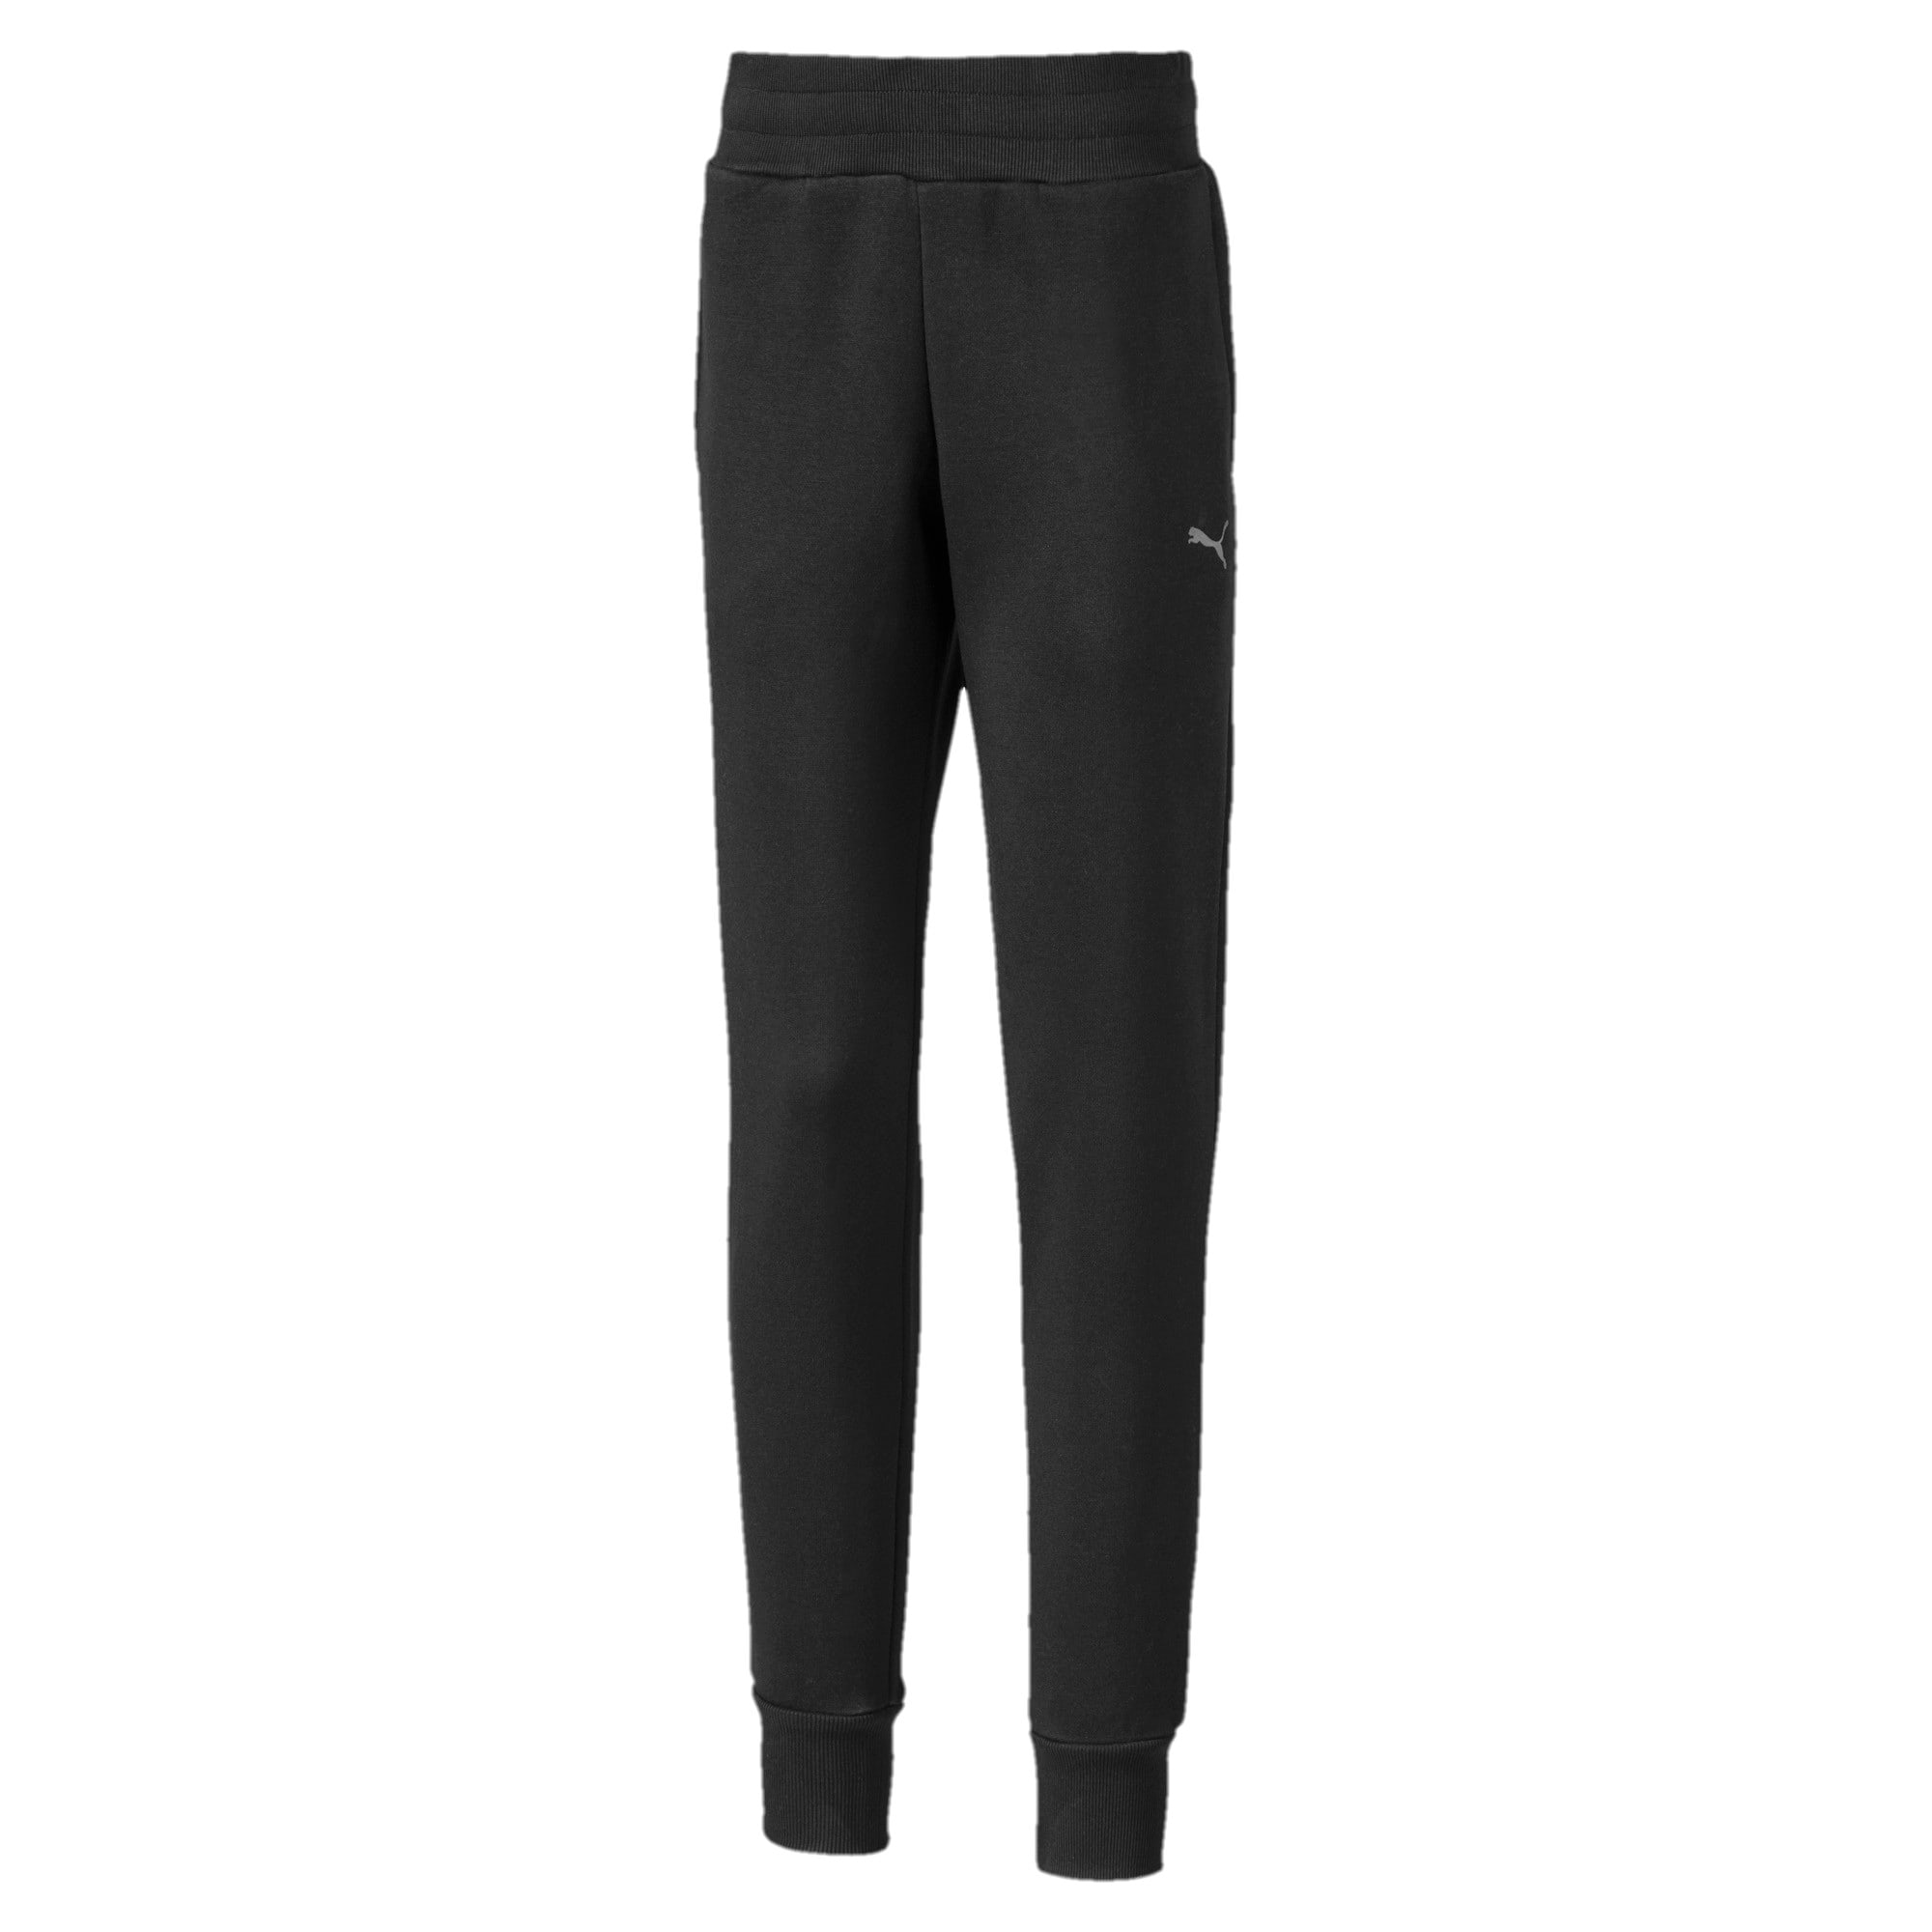 Thumbnail 1 of Girls' Sweatpants, Puma Black, medium-IND